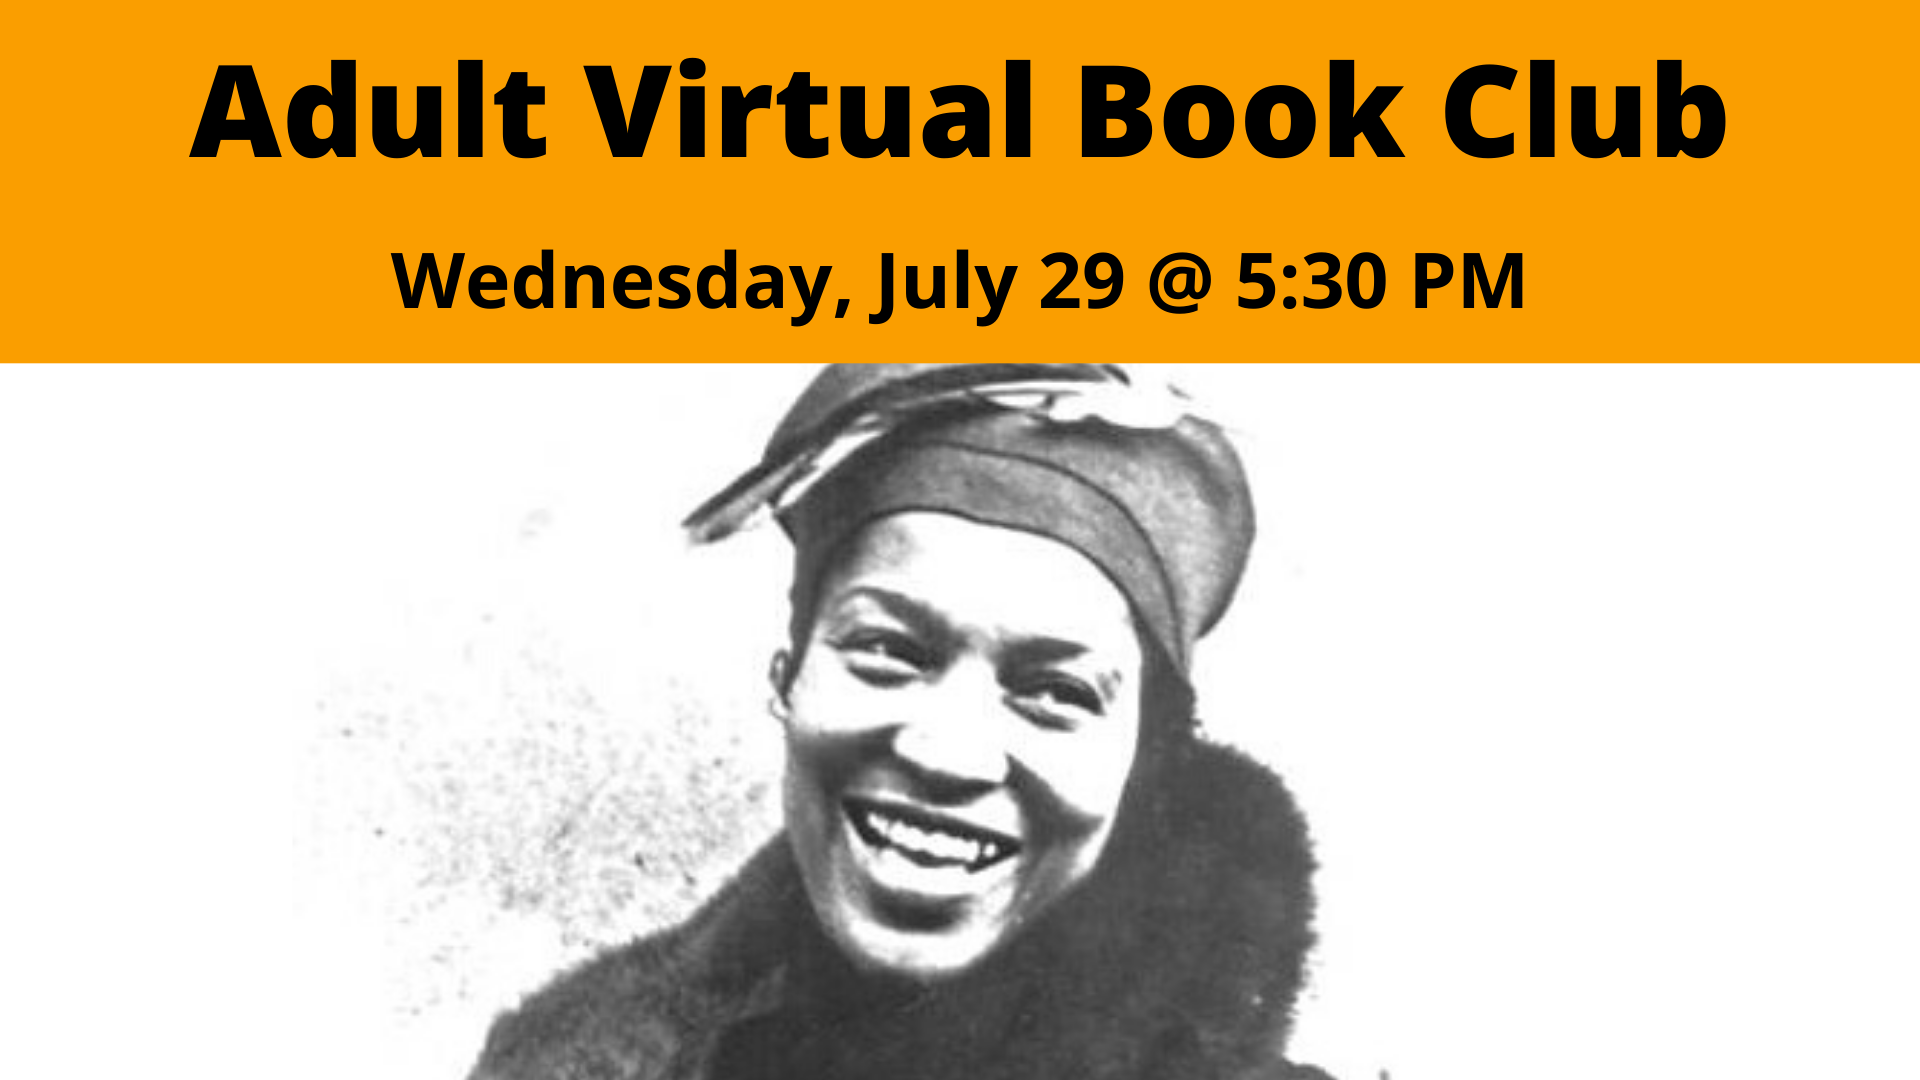 Adult Virtual Book Club